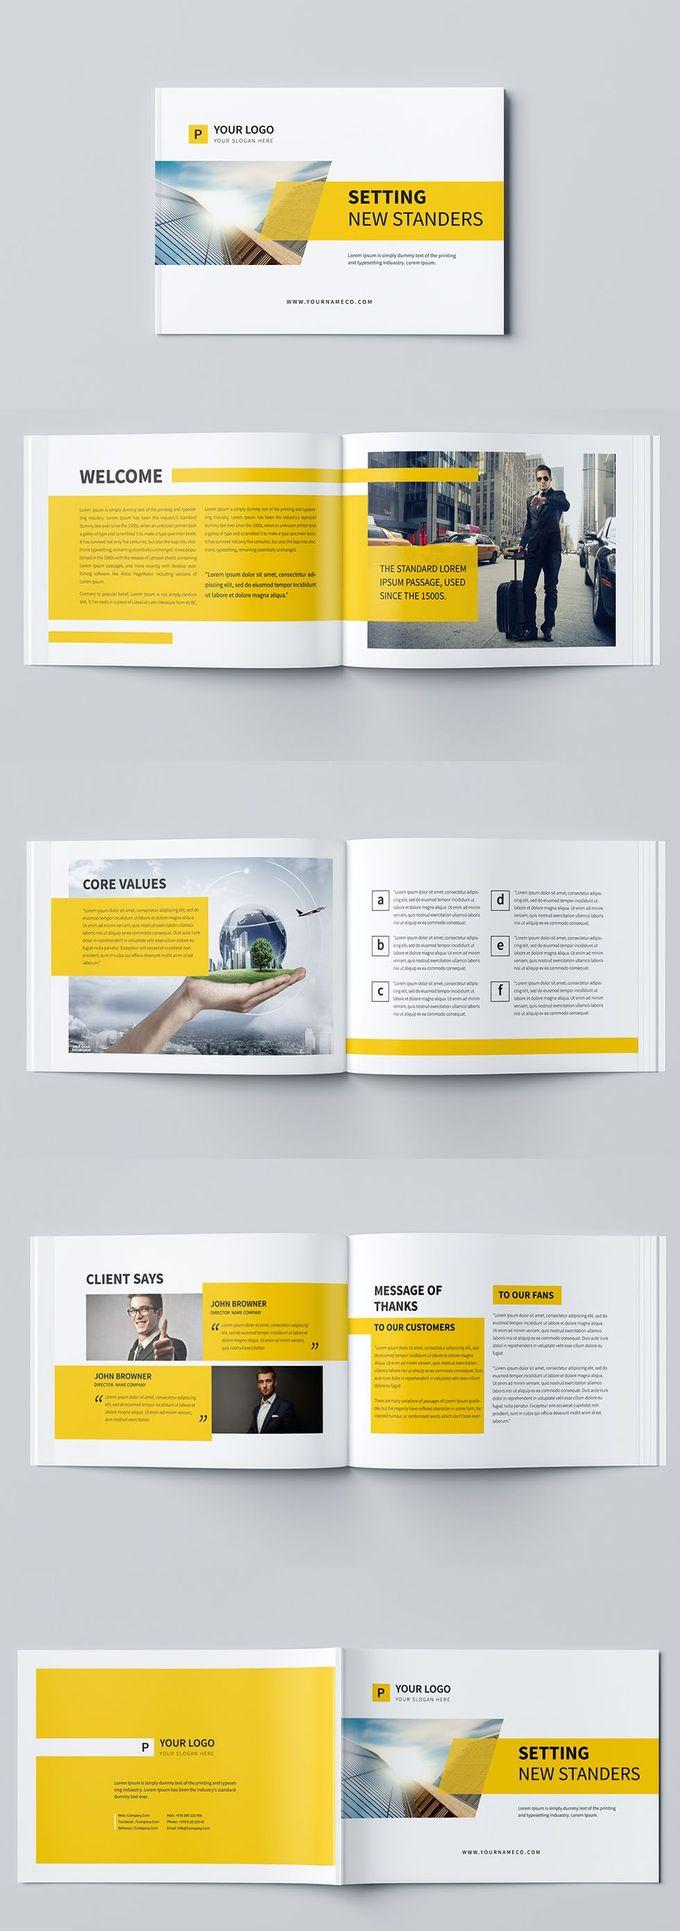 26 Best and Creative Brochure Design Ideas for your inspiration   Read full article: http://webneel.com/26-best-and-creative-brochure-design-ideas-your-inspiration   more http://webneel.com/brochure-designs   Follow us www.pinterest.com/webneel